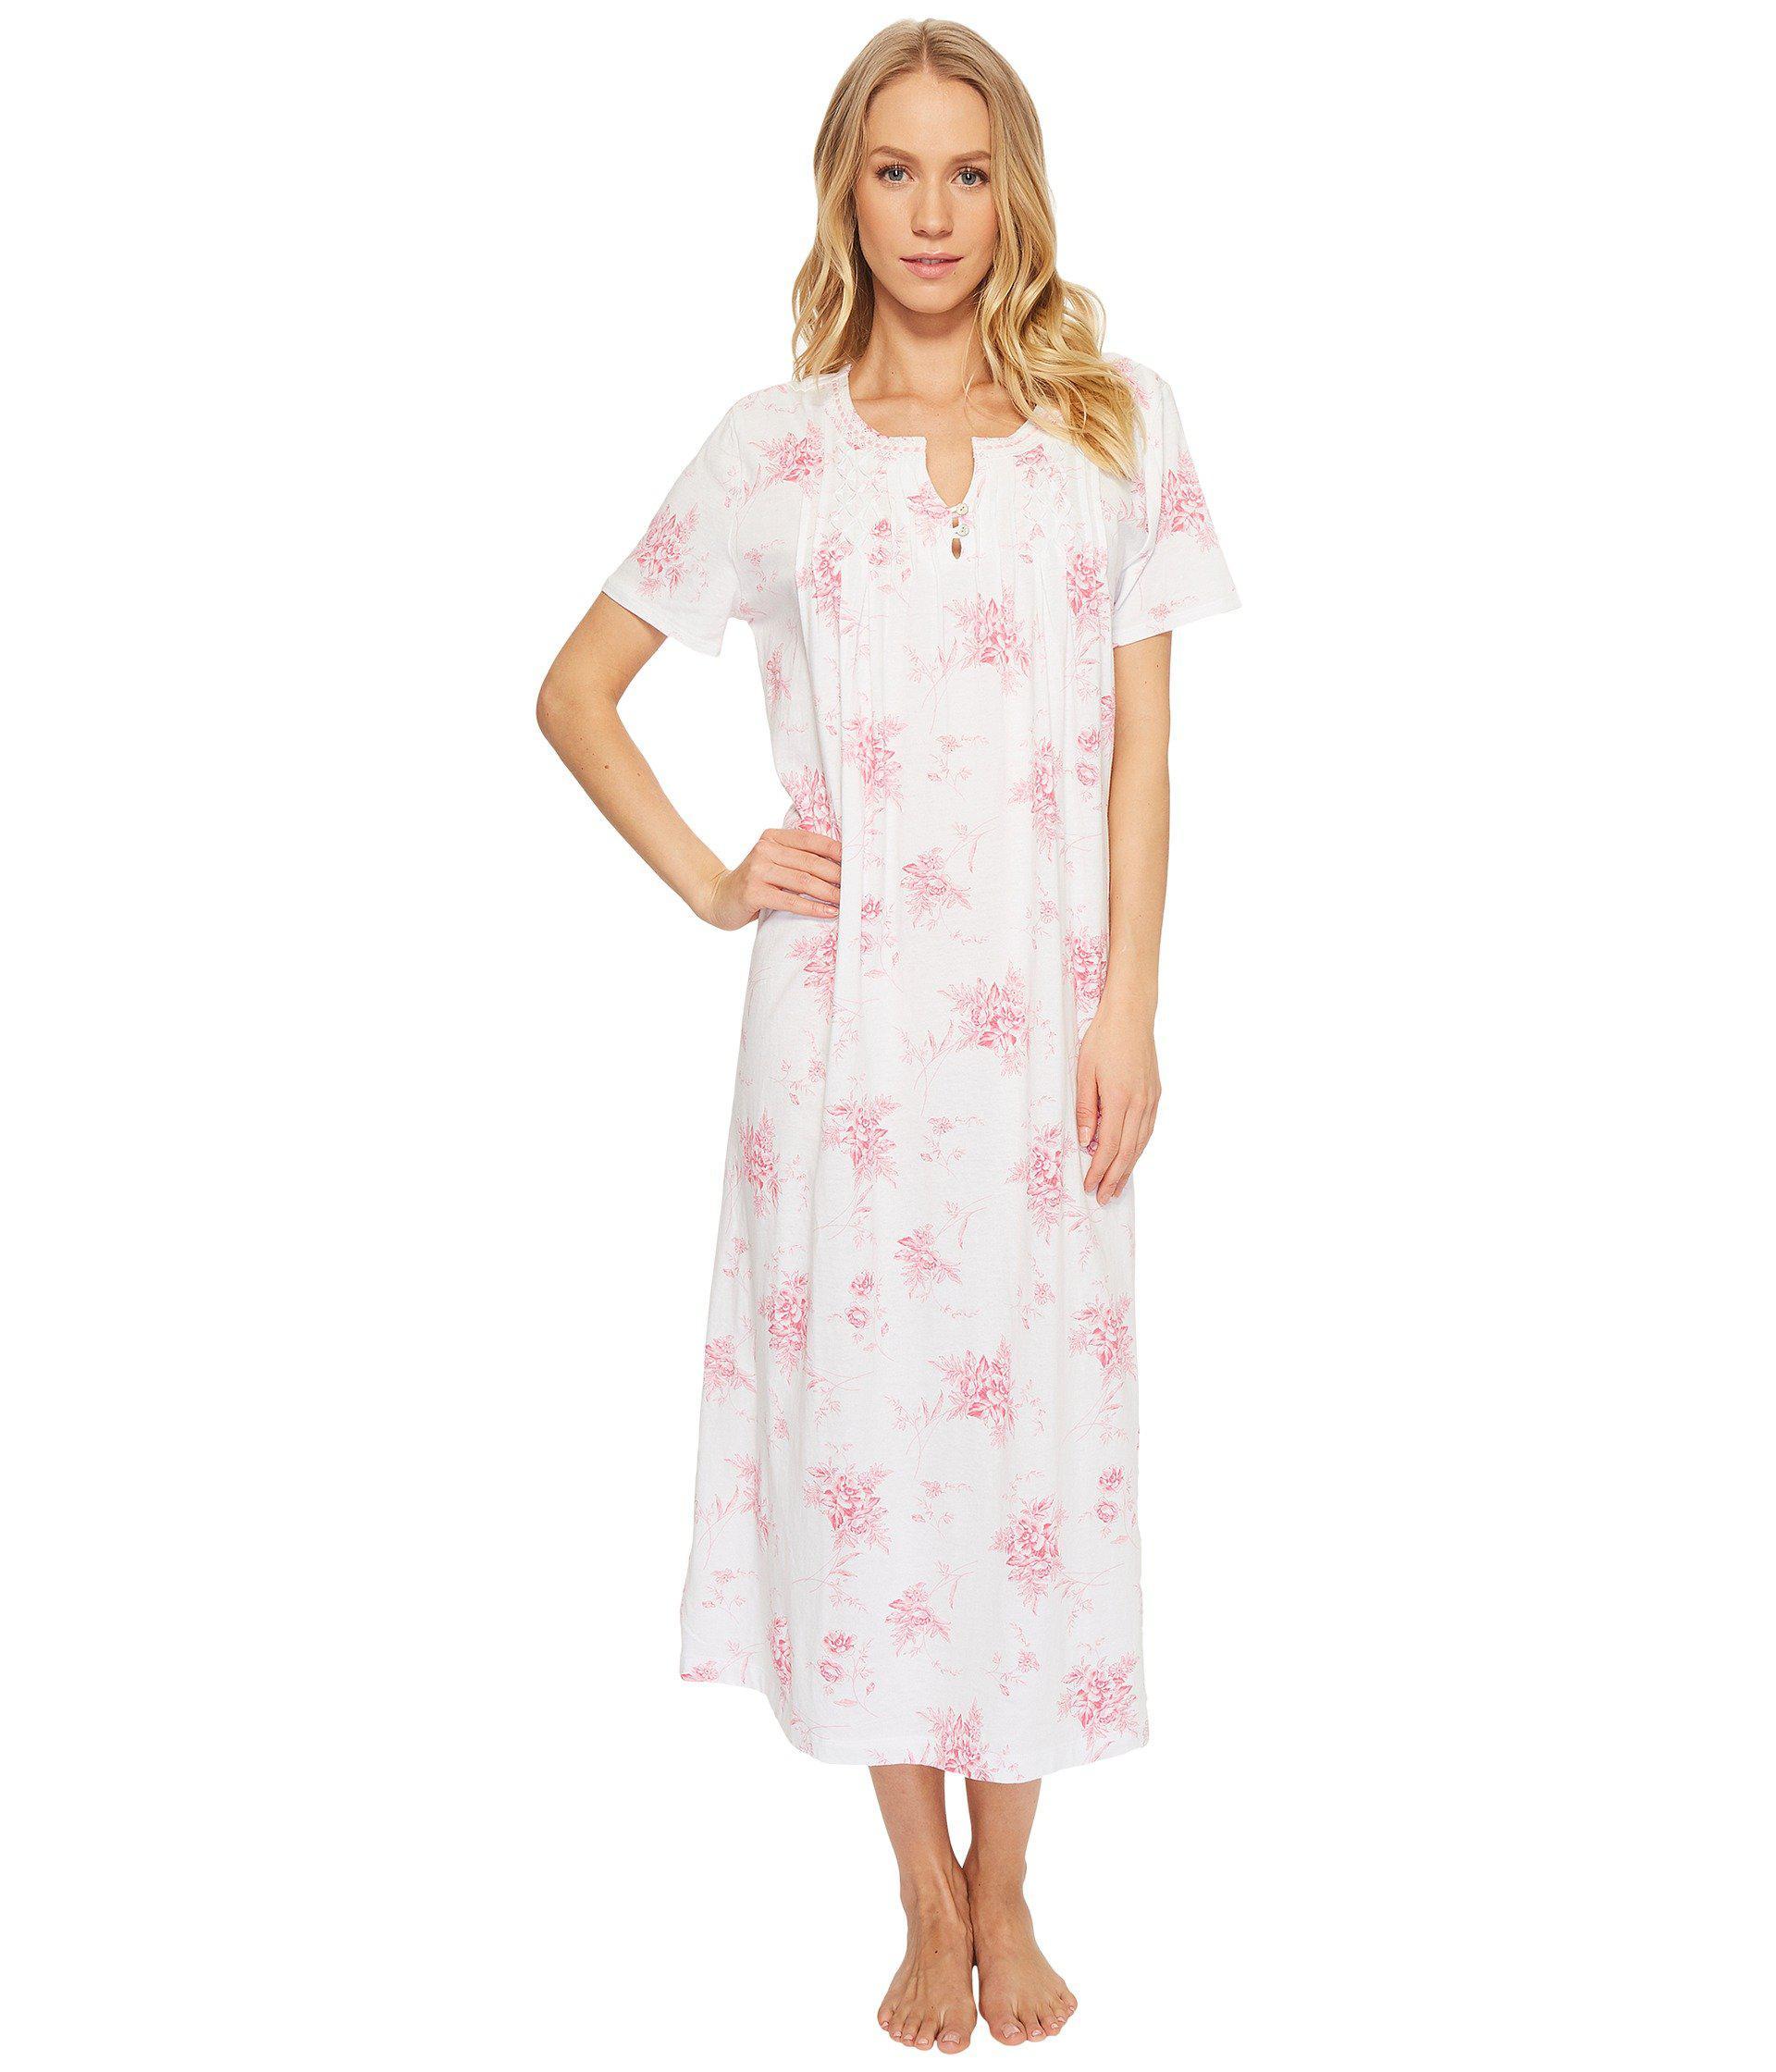 Lyst - Carole hochman Short Sleeve Long Gown